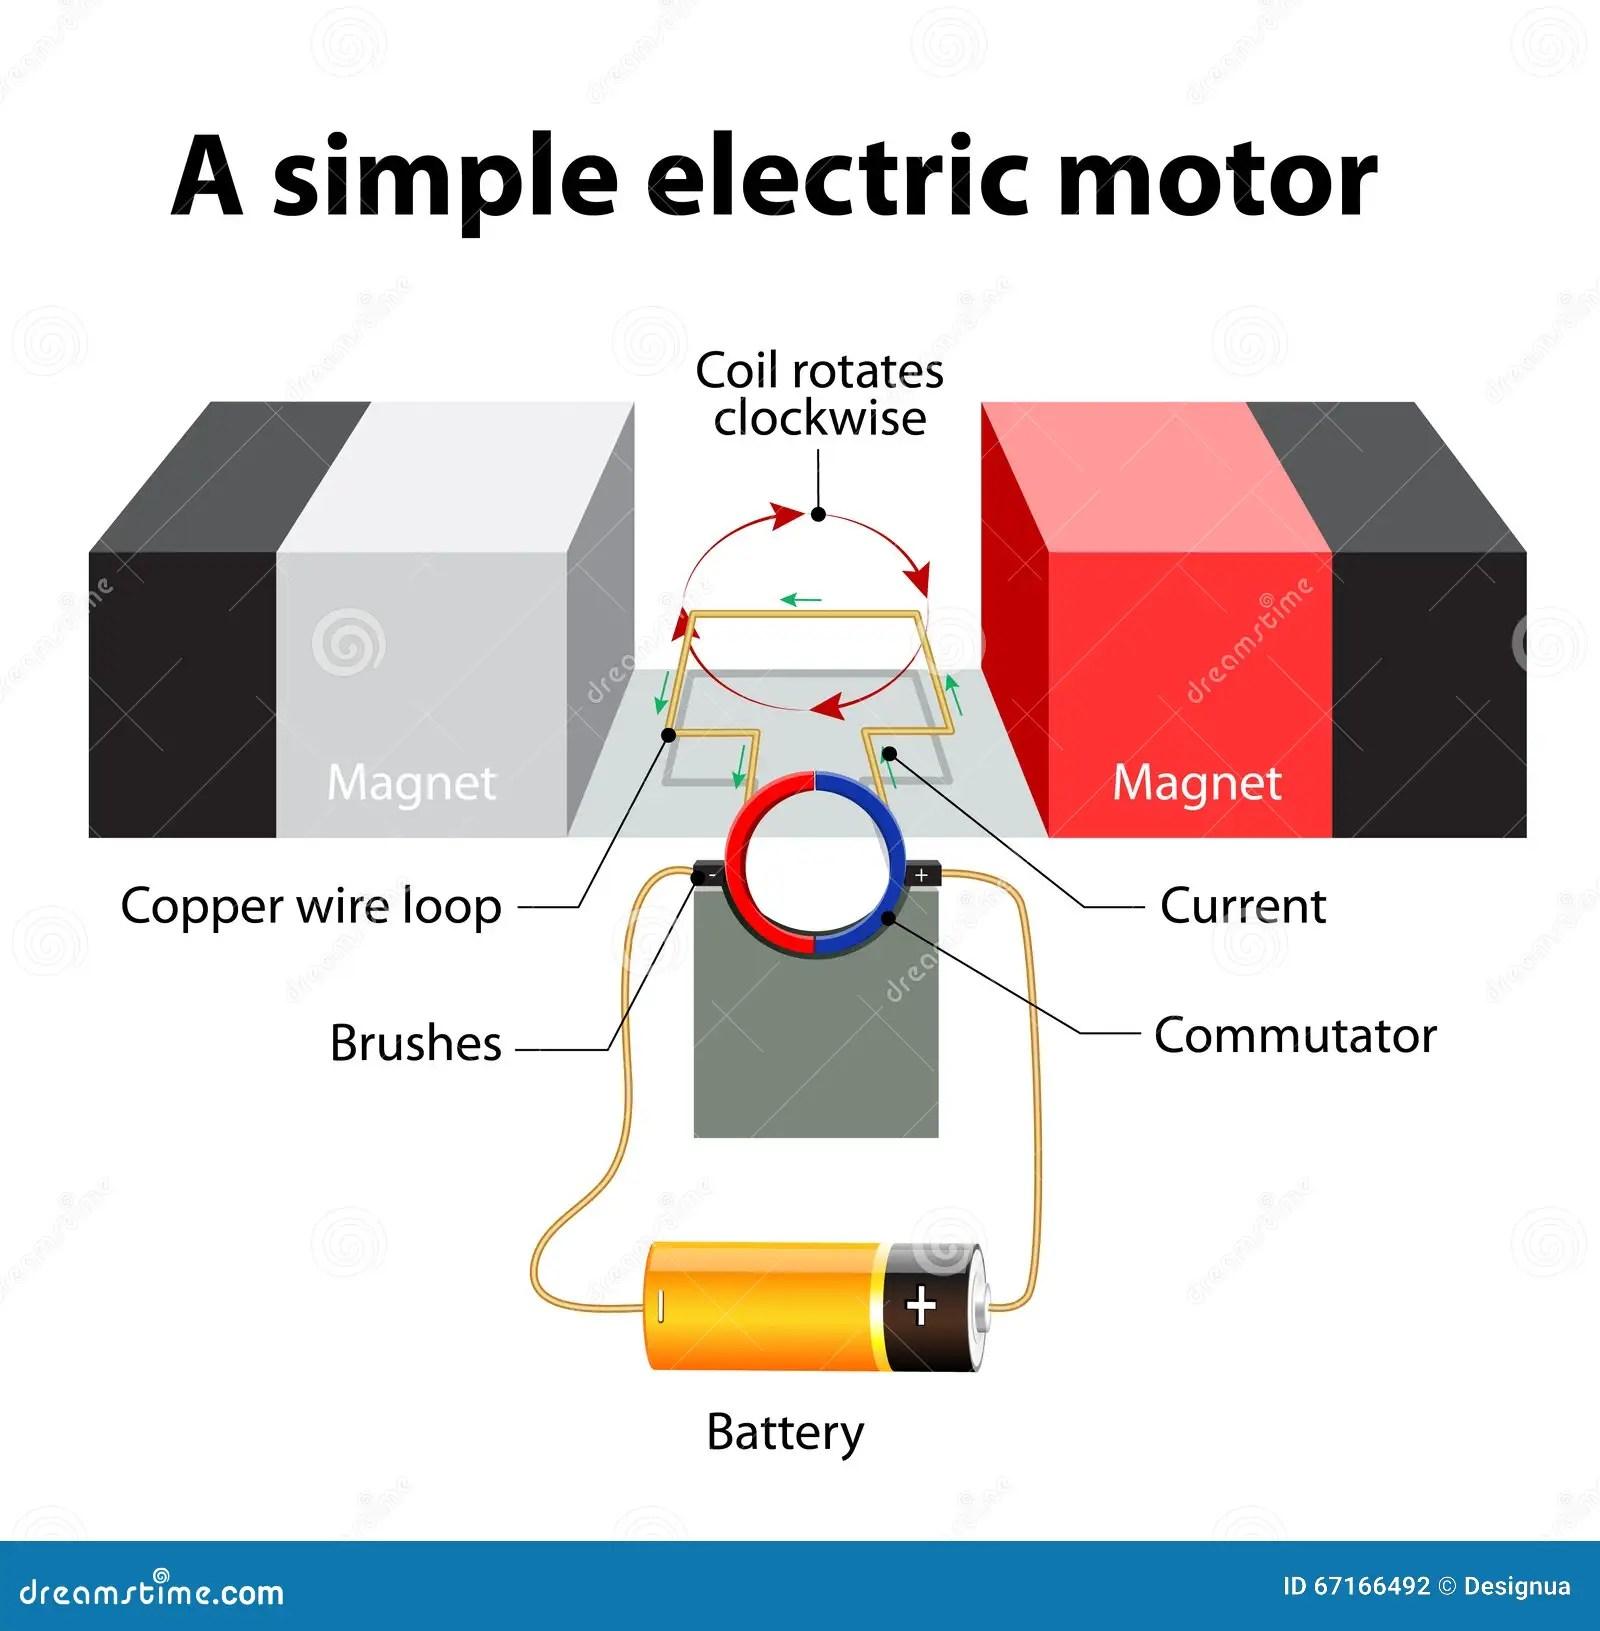 simple electric motor vector diagram rectangular loop wire sitting inside magnetic field commutator circular metal 67166492?resize=806%2C832&ssl=1 simple electric motor with magnets motorssite org